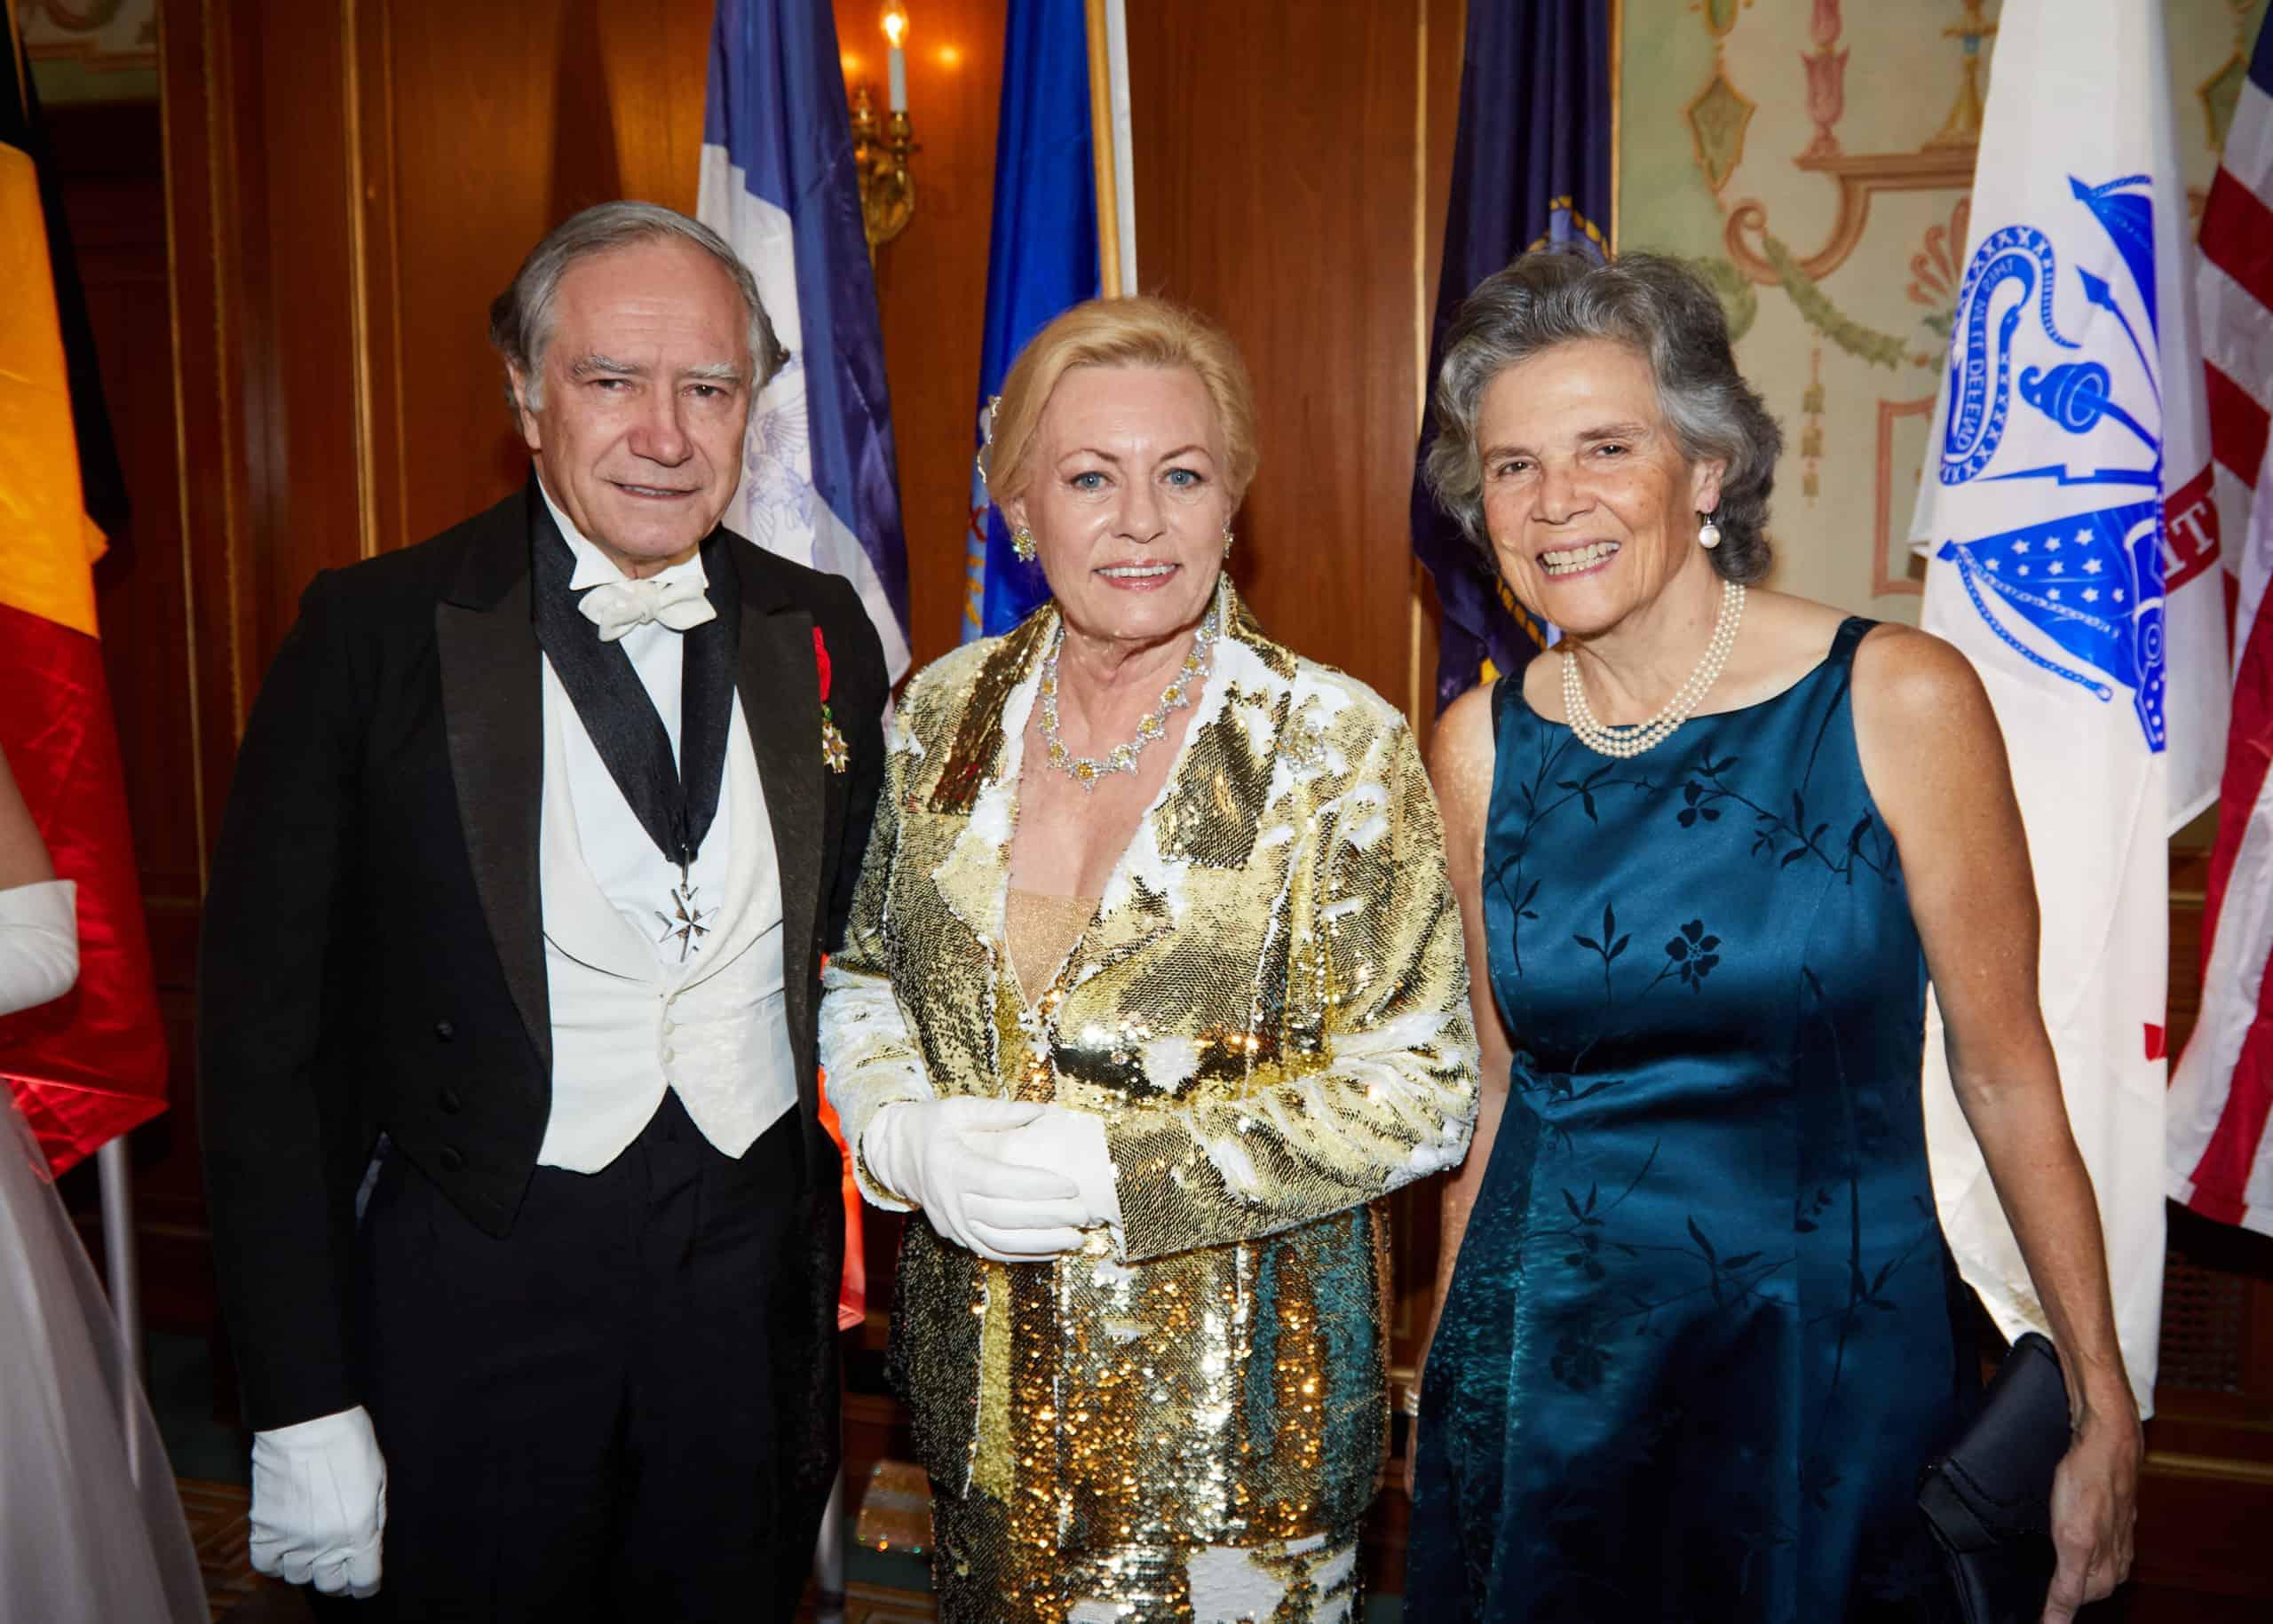 Kip Forbes, Julia Irene Kauffman and Moira Mumma